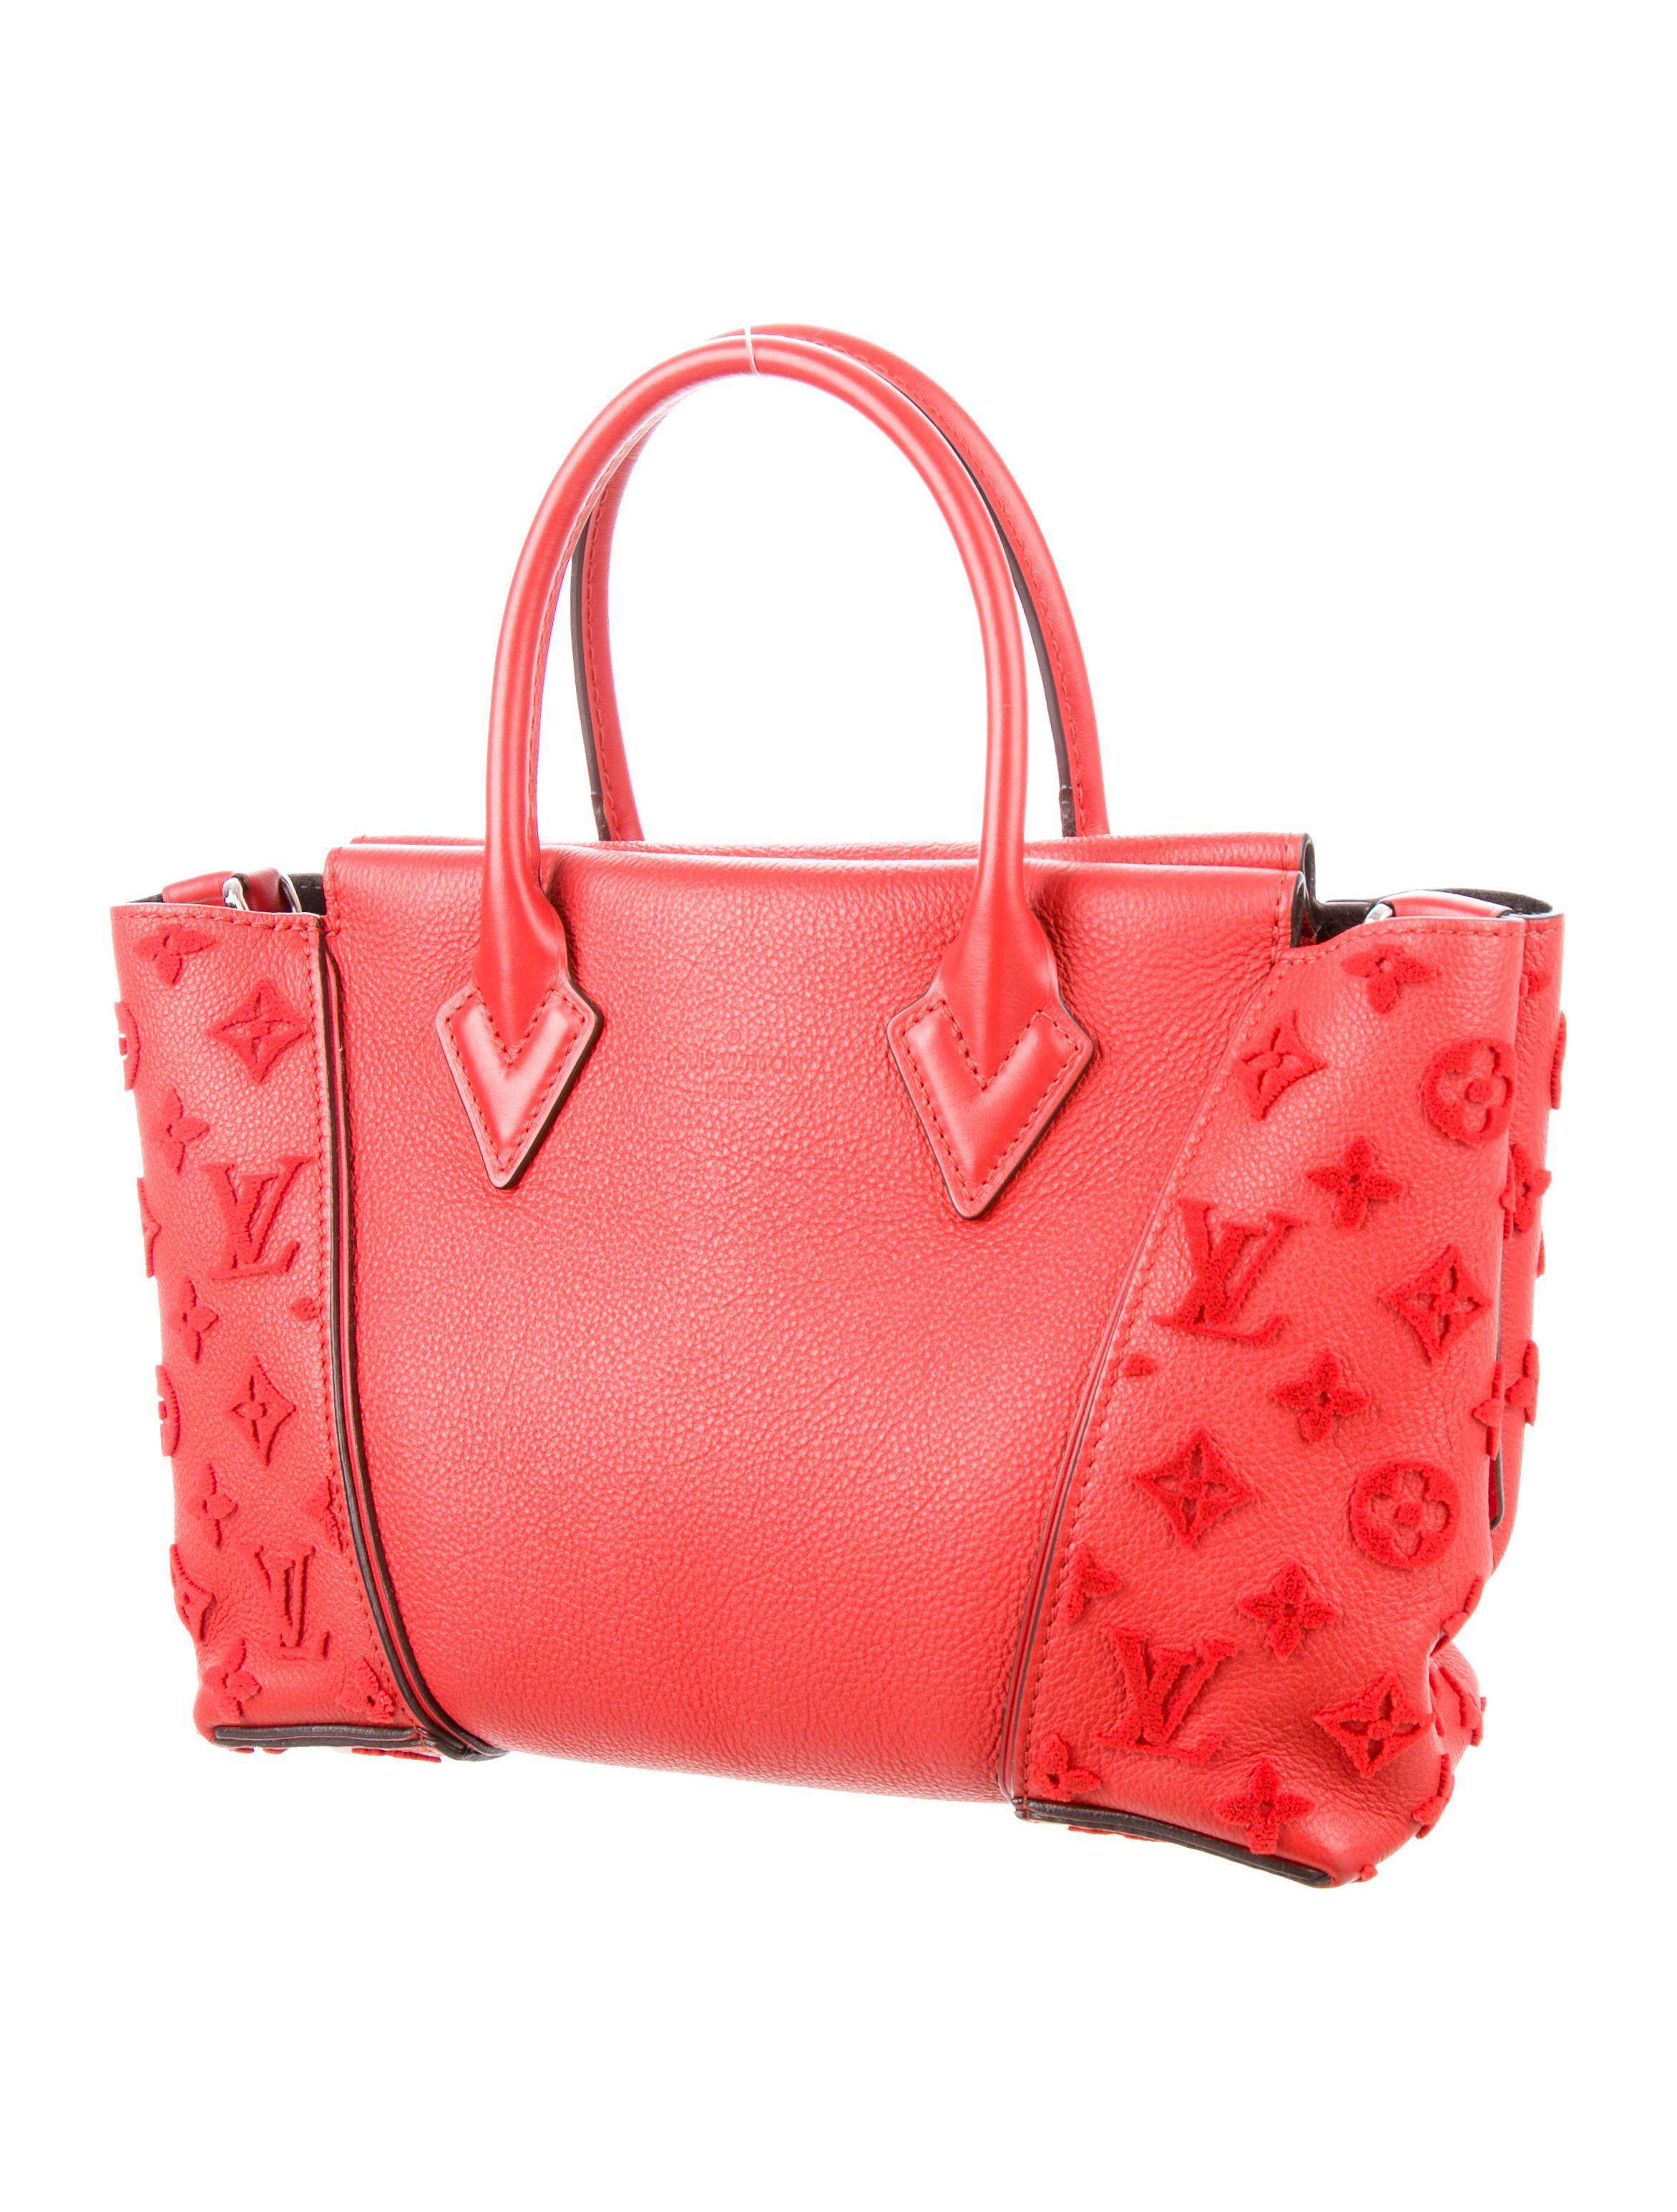 f5382938874e Lyst - Louis Vuitton Monogram Velours W Bb Red in Metallic